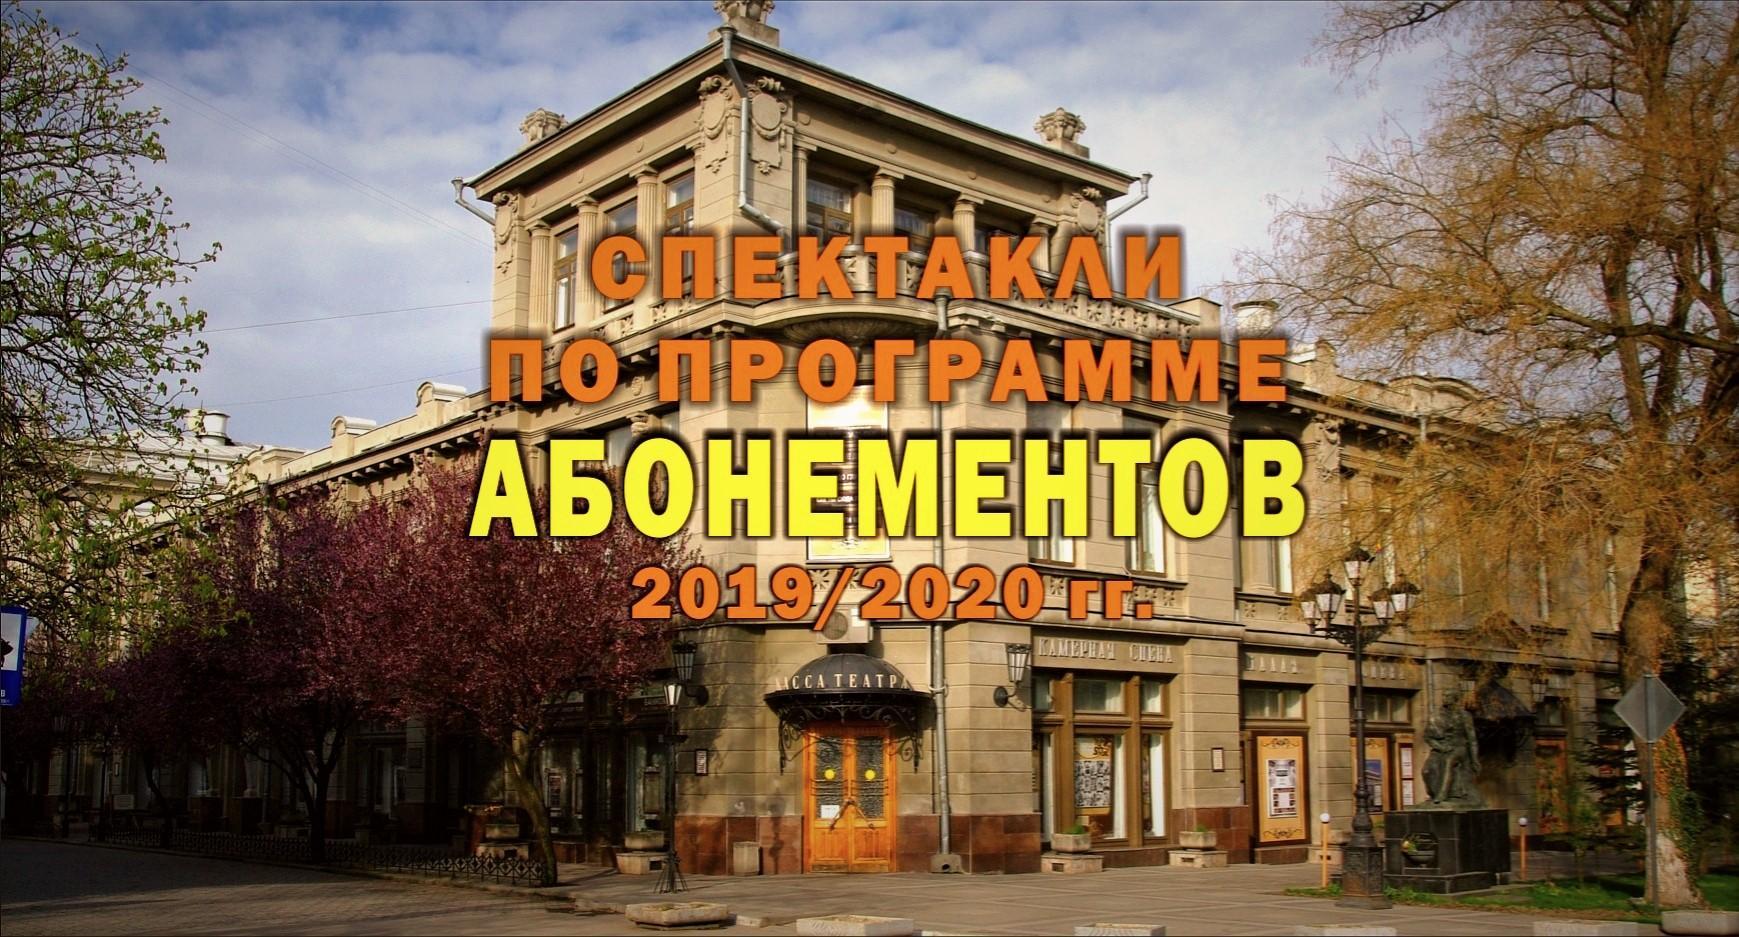 IMG_20201126_143402